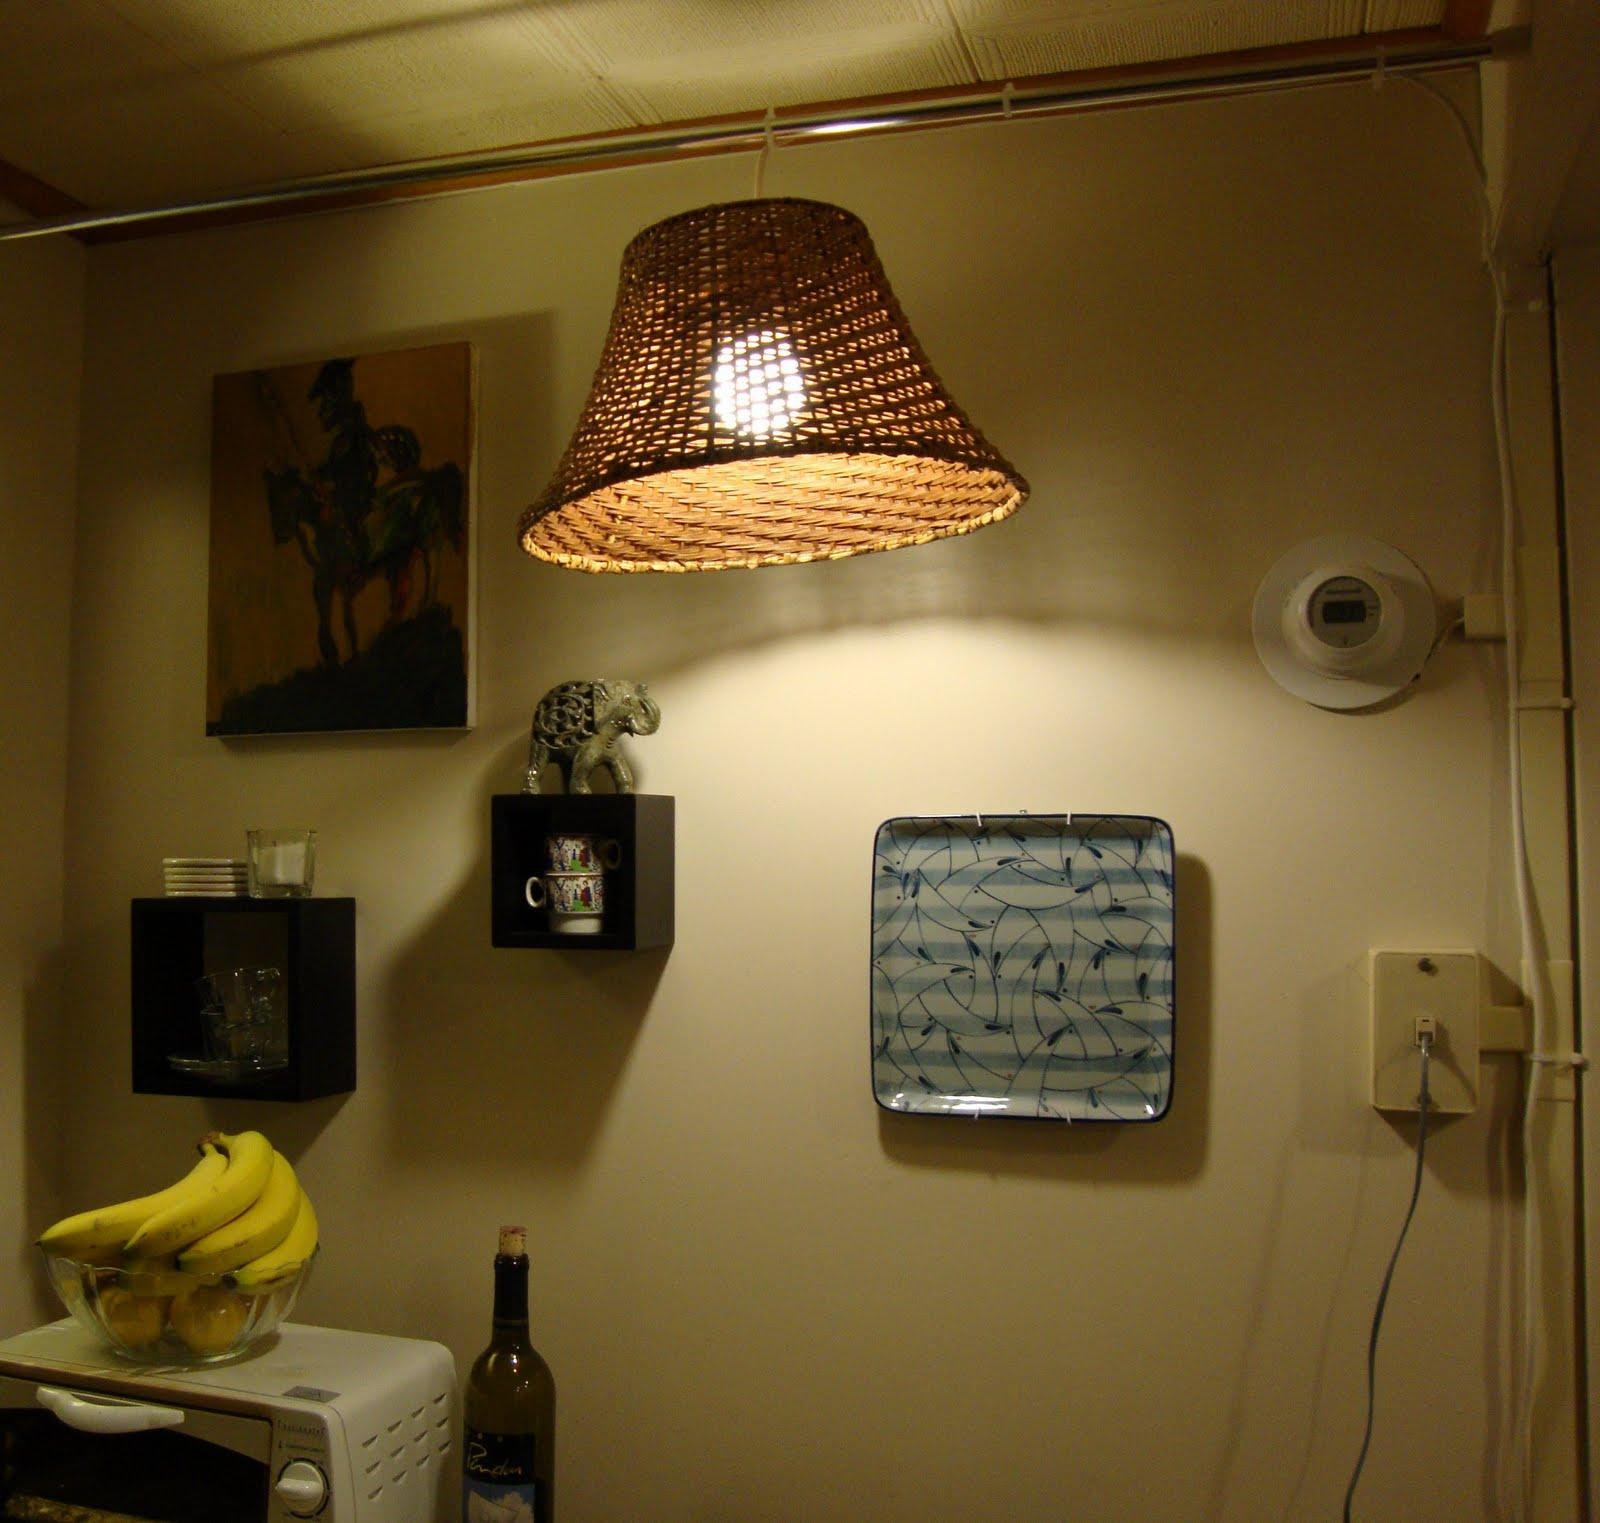 Tension Rod Hanging Lamp IKEA Hackers IKEA Hackers